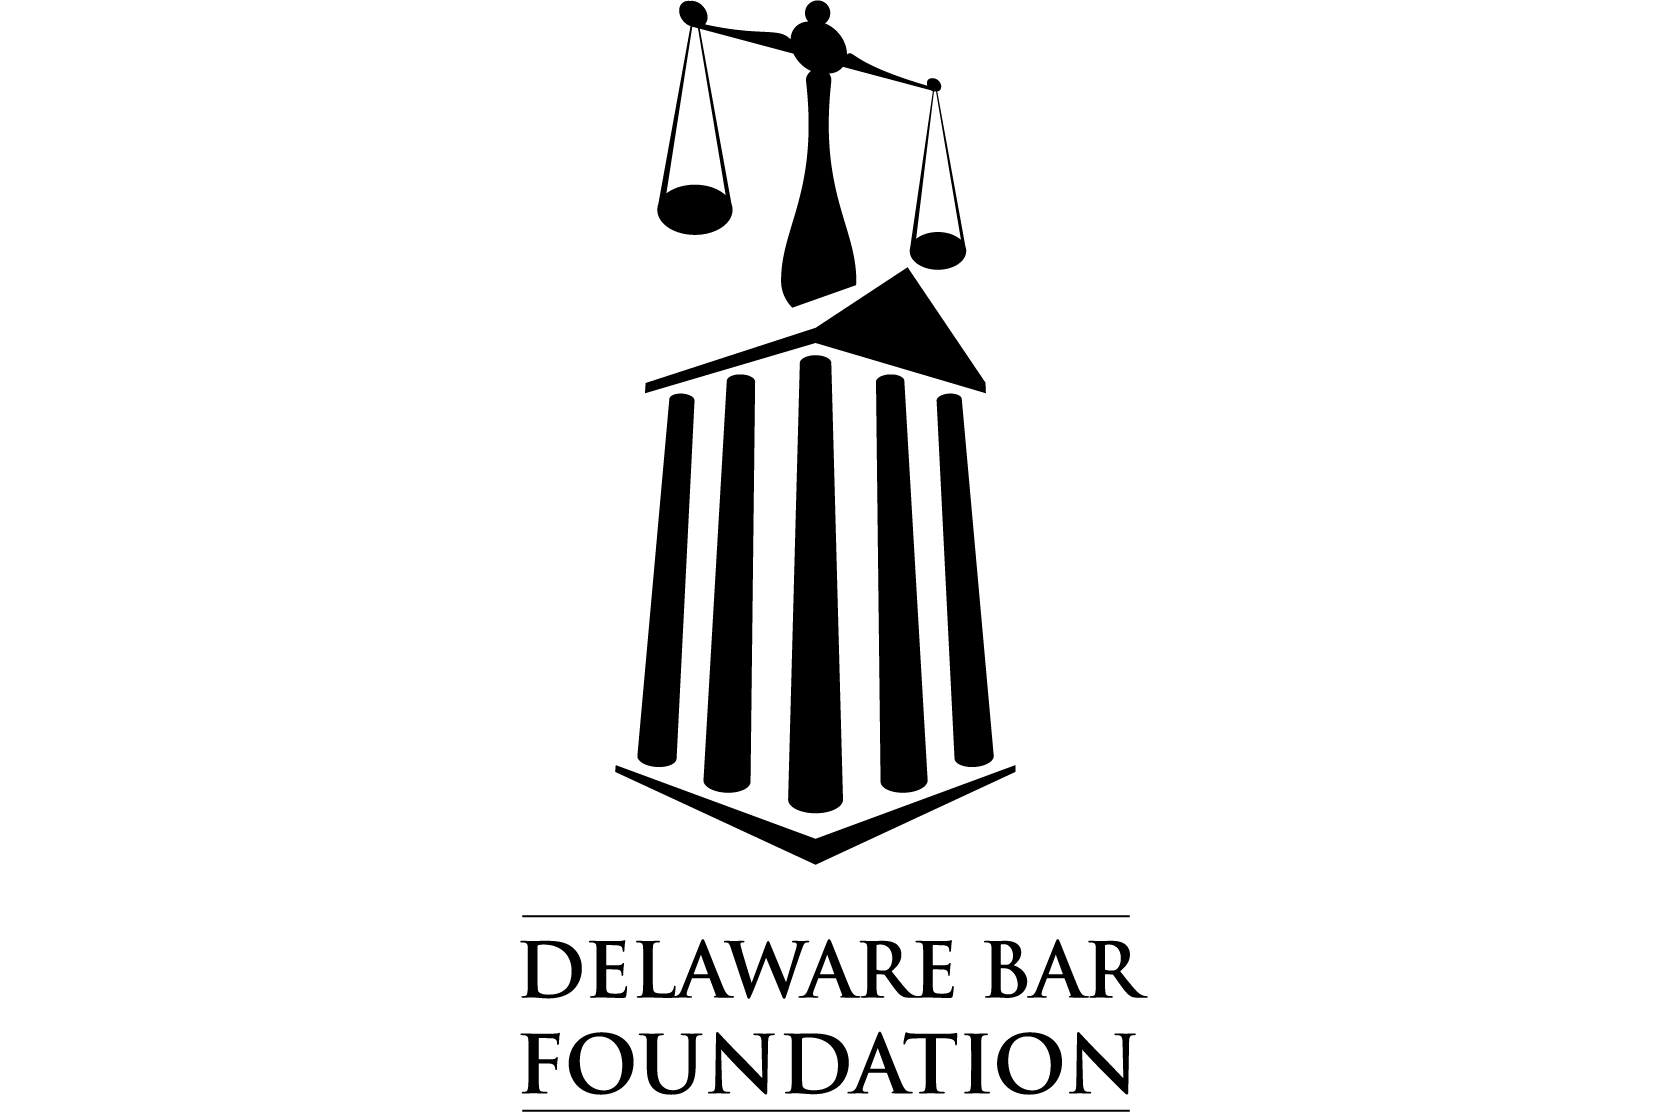 https://iolta.org/wp-content/uploads/DBF_Logo_BW.png